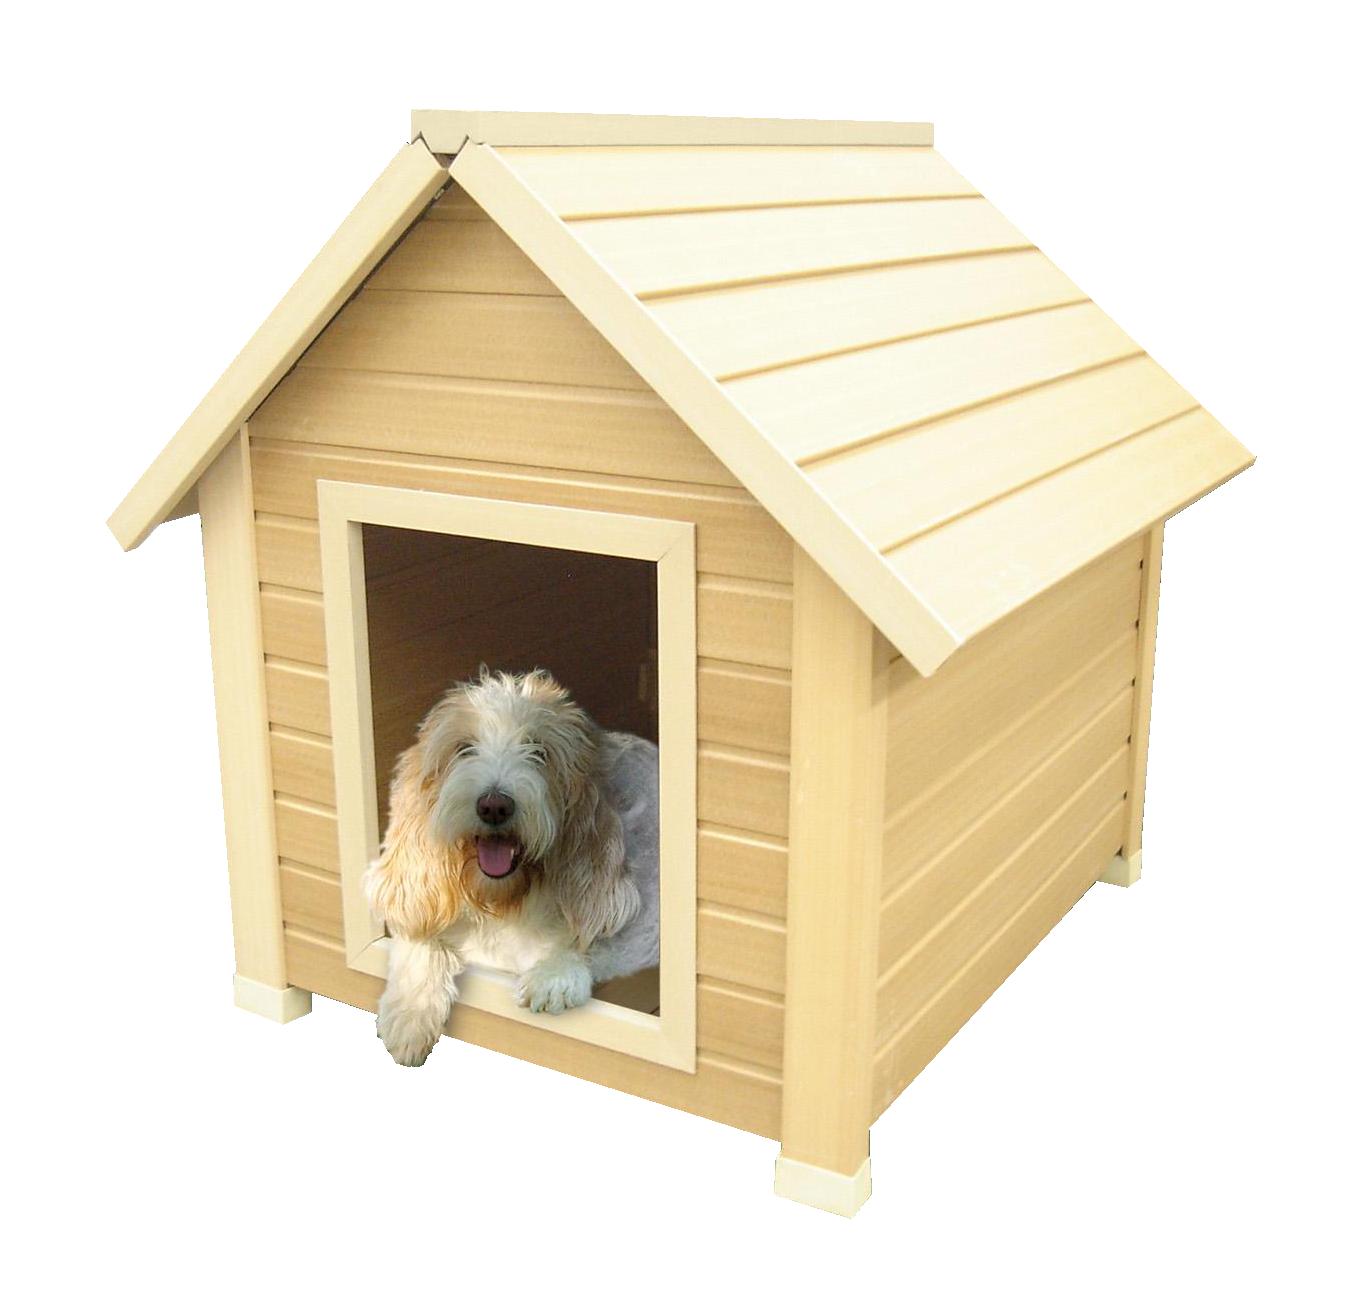 Doghouse clipart dog pen. House png transparent image